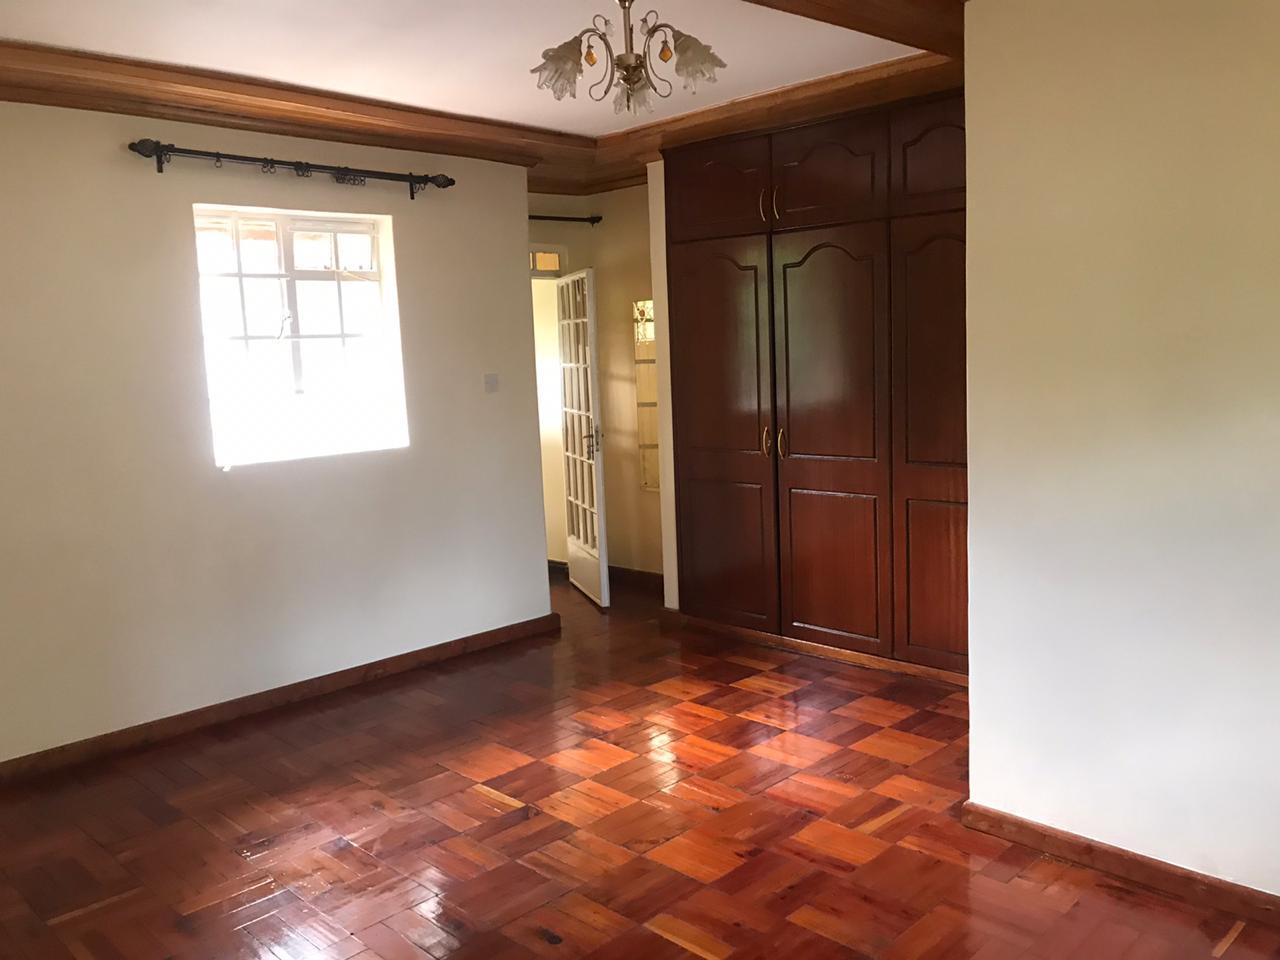 5 Bedroom all en suite, Garden, Family Room Spacious asking Ksh200k located in Lavington